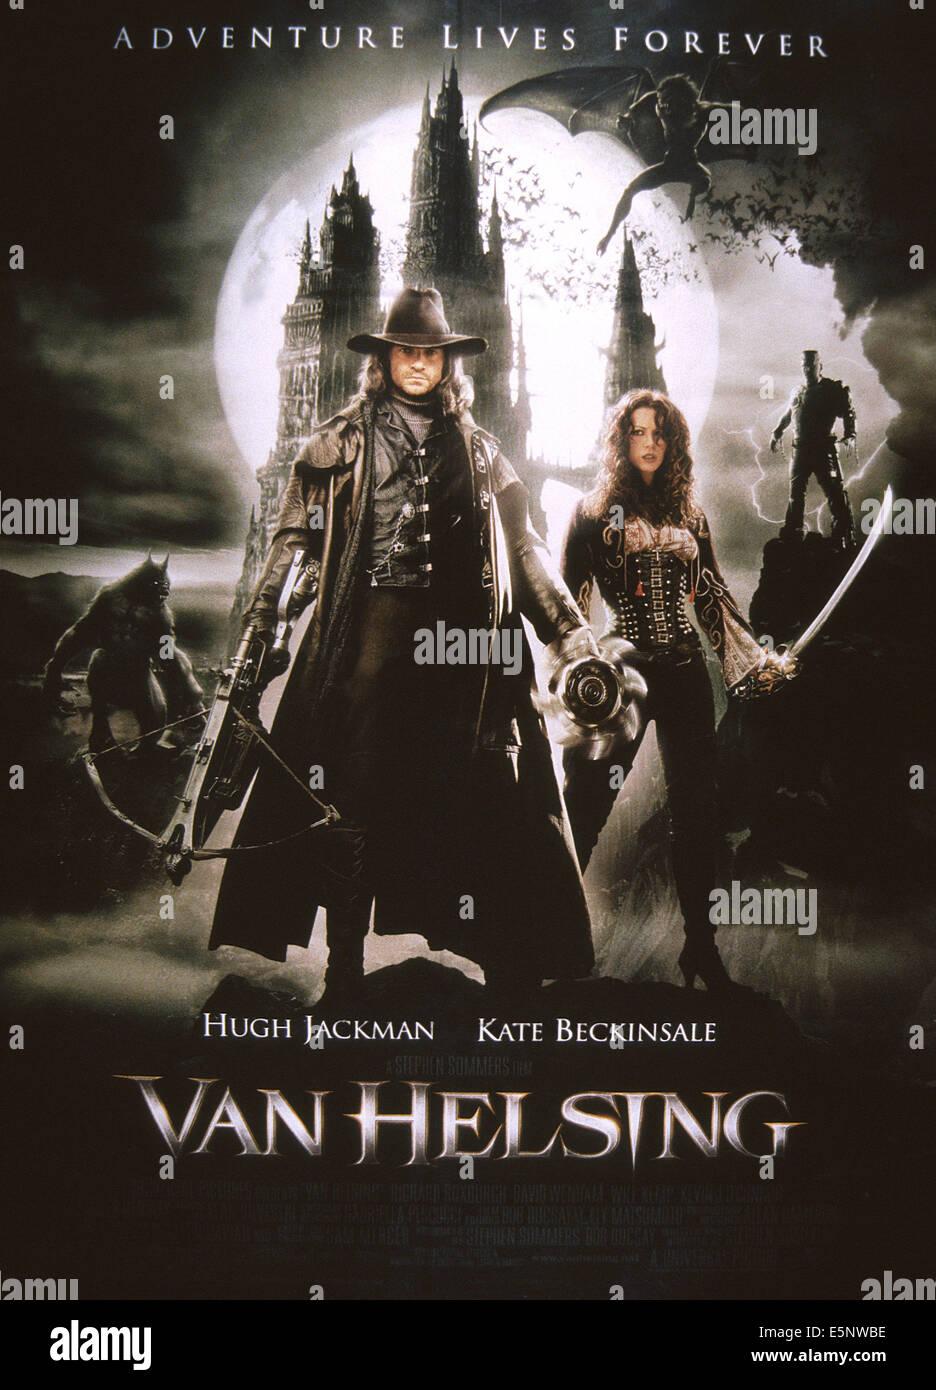 VAN HELSING, US poster art, from left: Hugh Jackman, Kate Beckinsale, 2004. © Universal Pictures/courtesy Everett - Stock Image